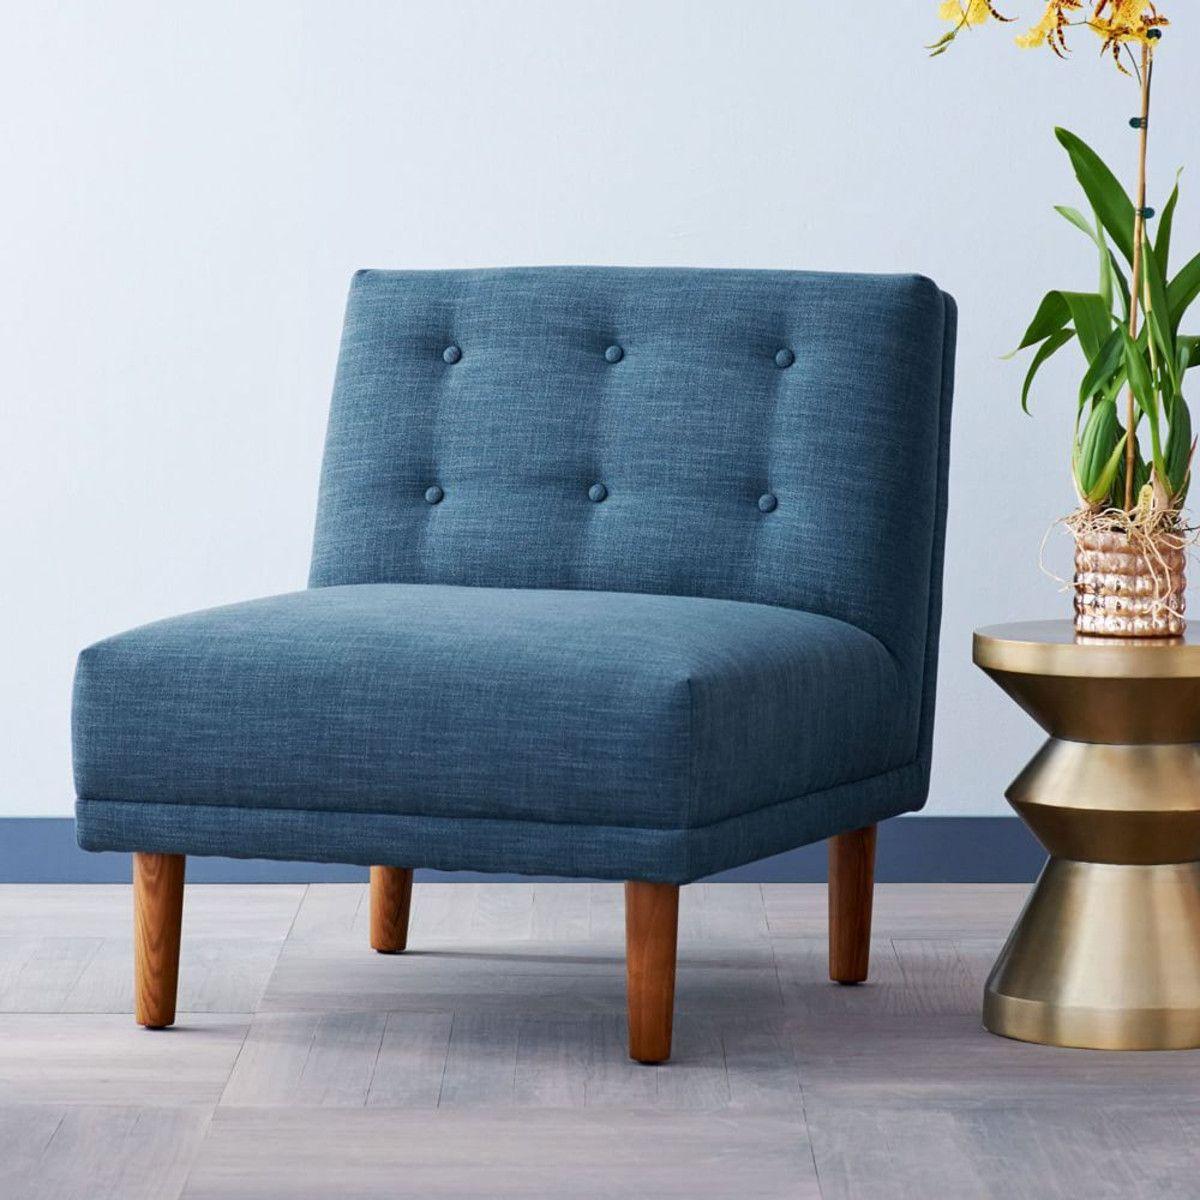 Rounded Retro Armless Chair west elm Australia Retro